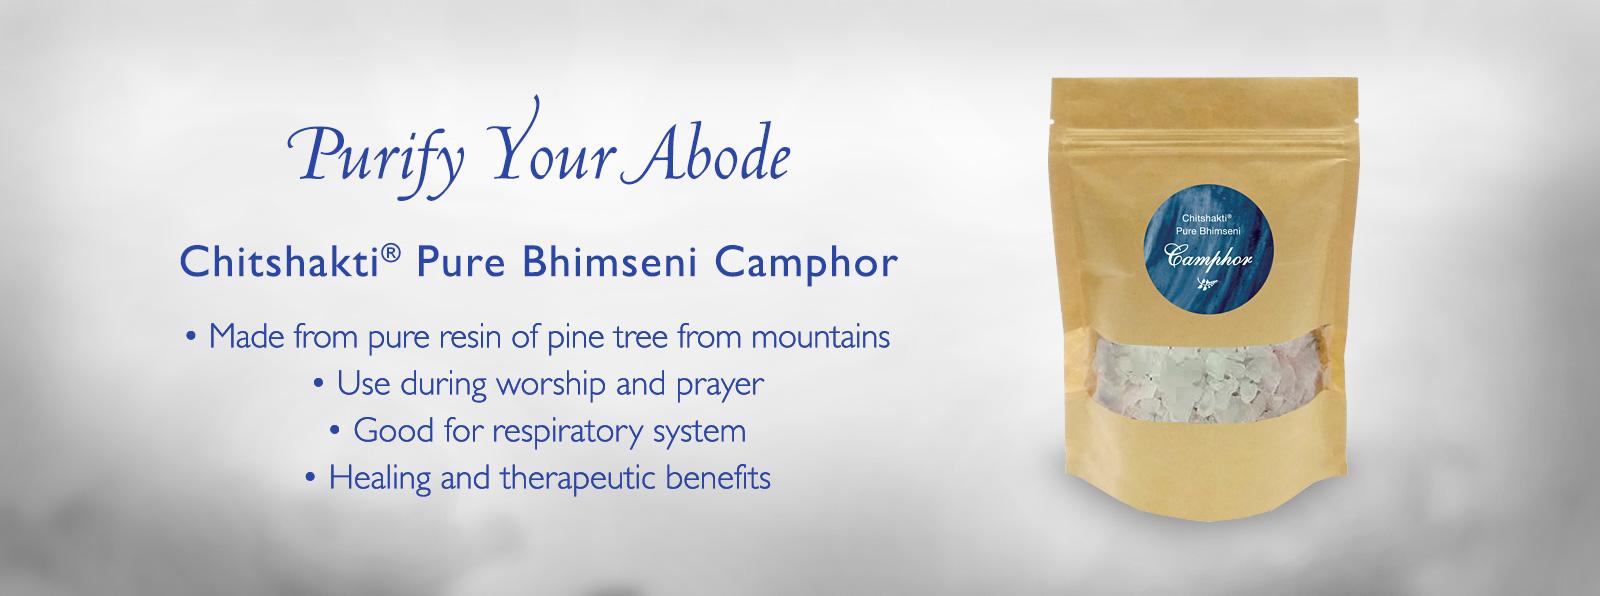 Chitshakti - Pure Bhimseni Camphor Banner